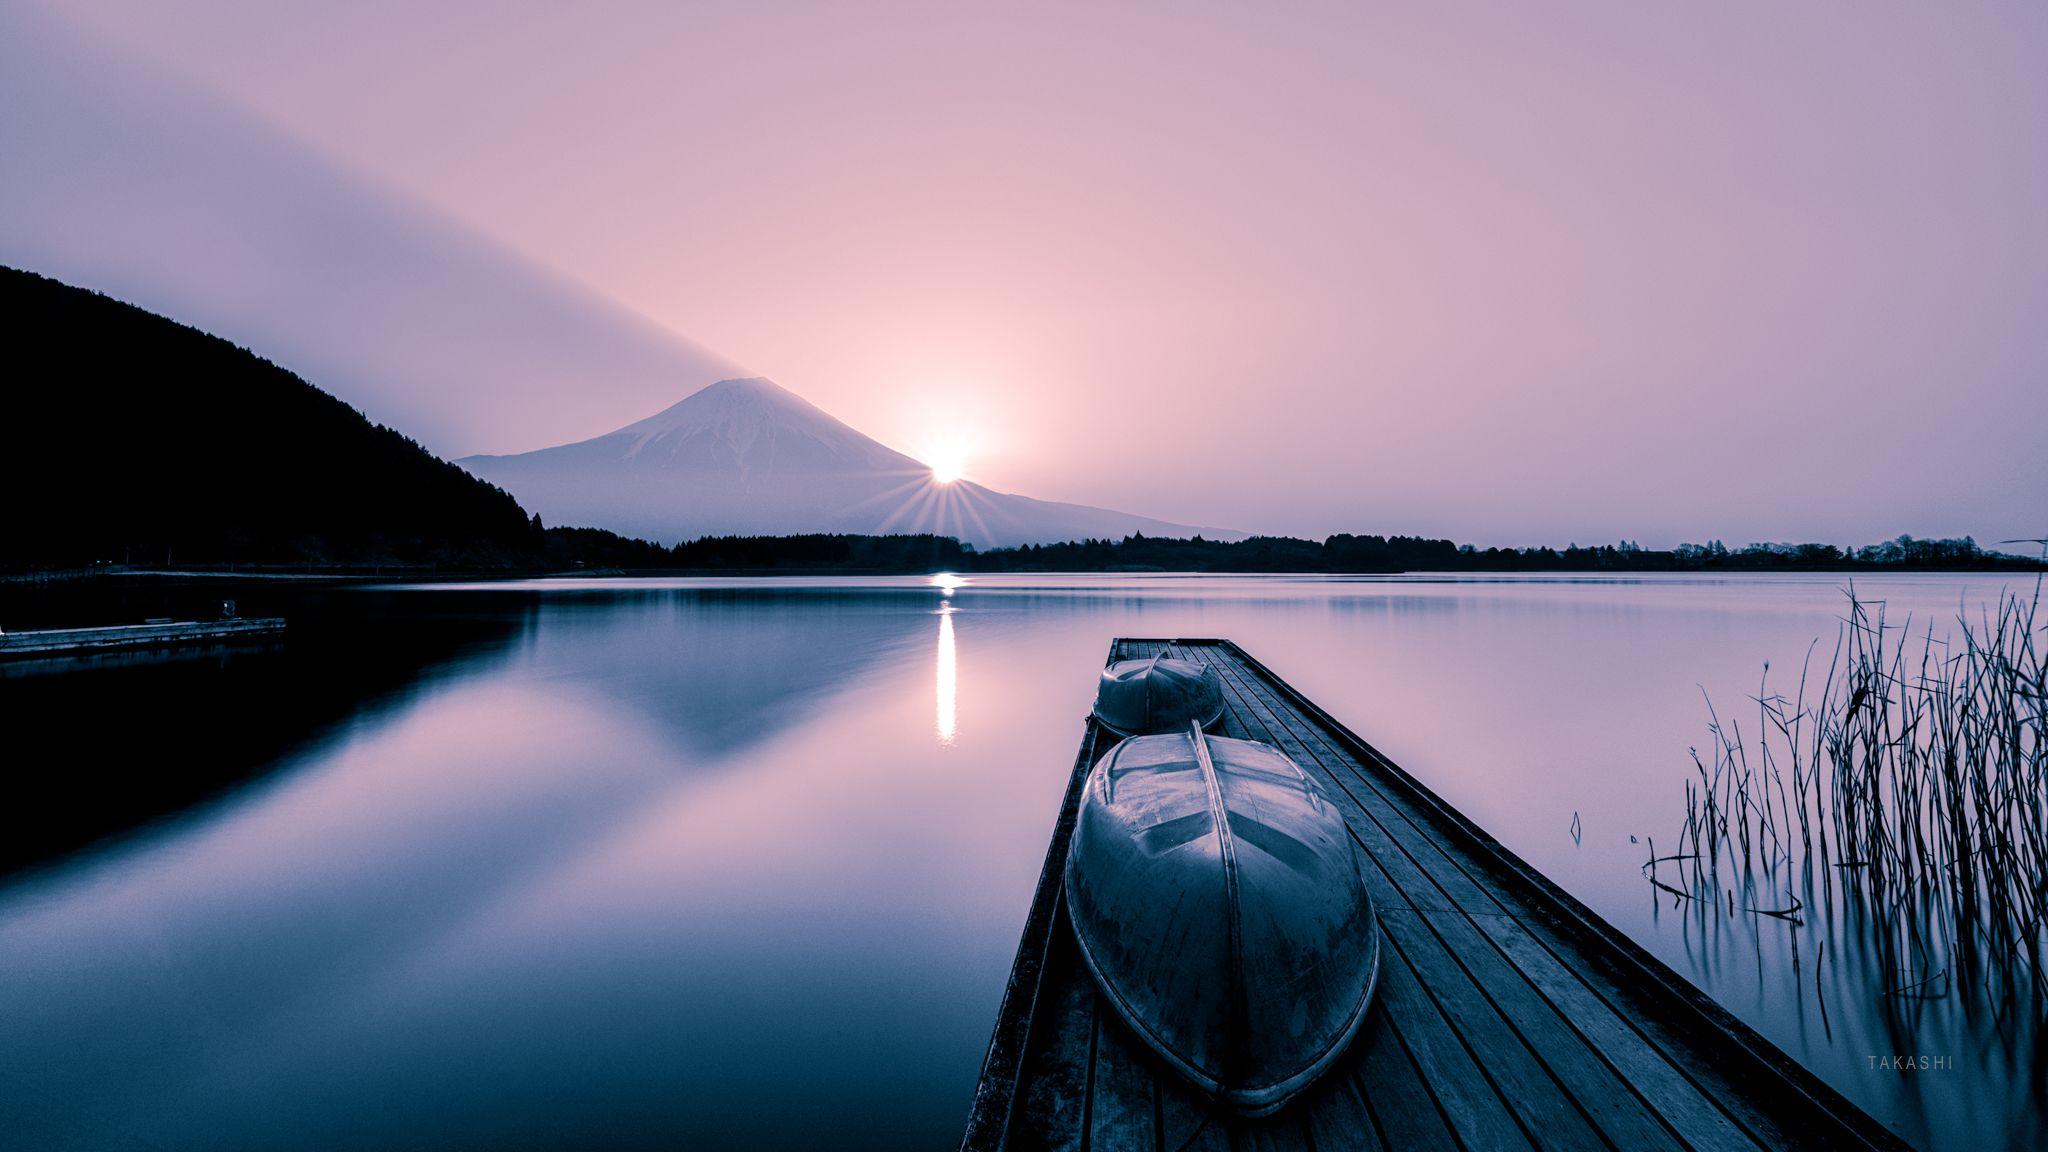 Fuji,Japan,mountain,lake,water,reflection,boat, Takashi